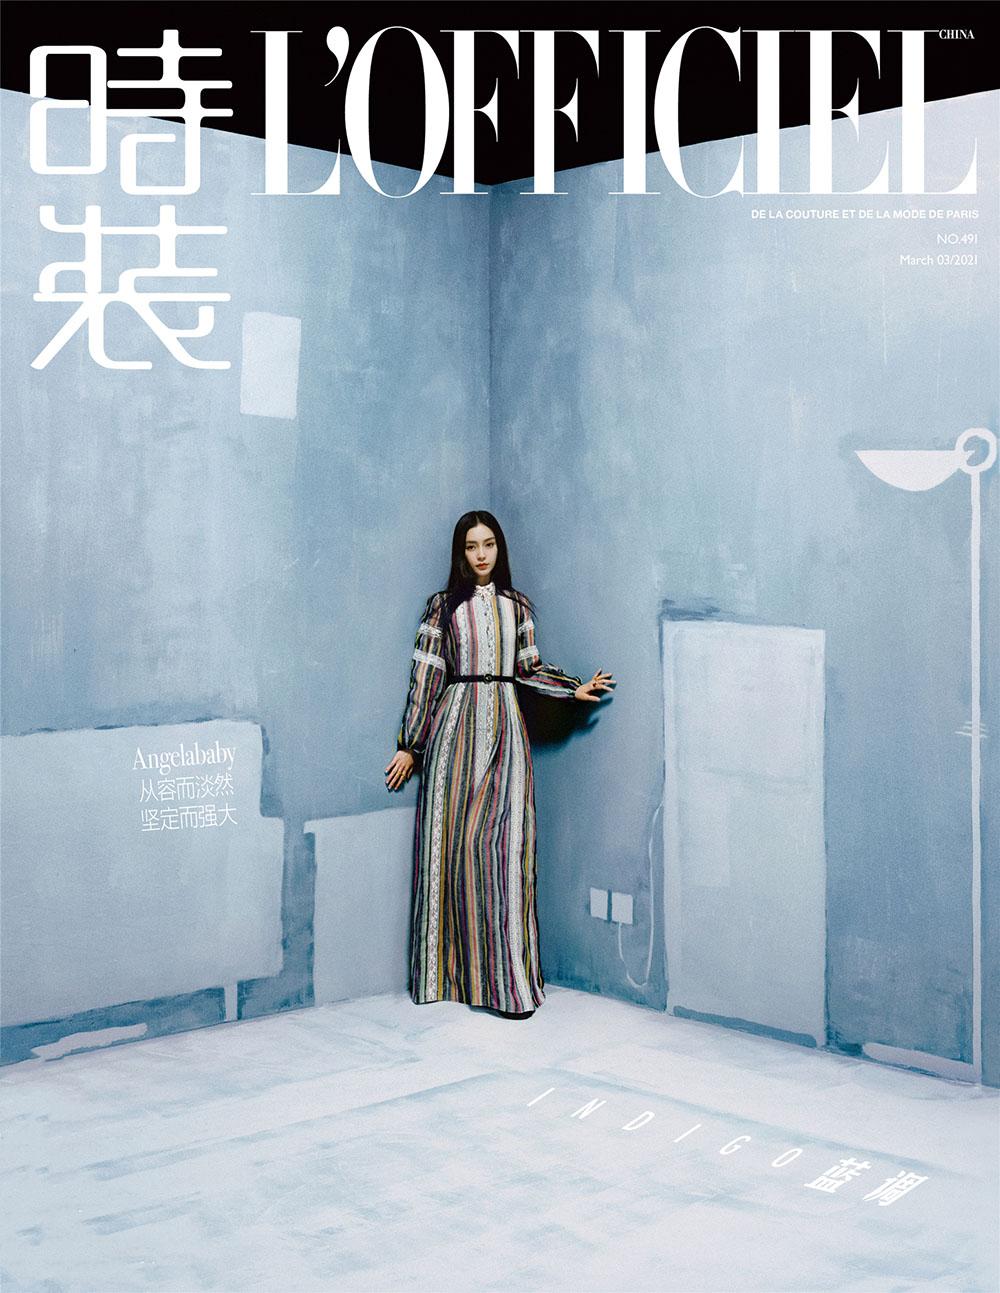 Angelababy《时装》三月刊封面.jpg